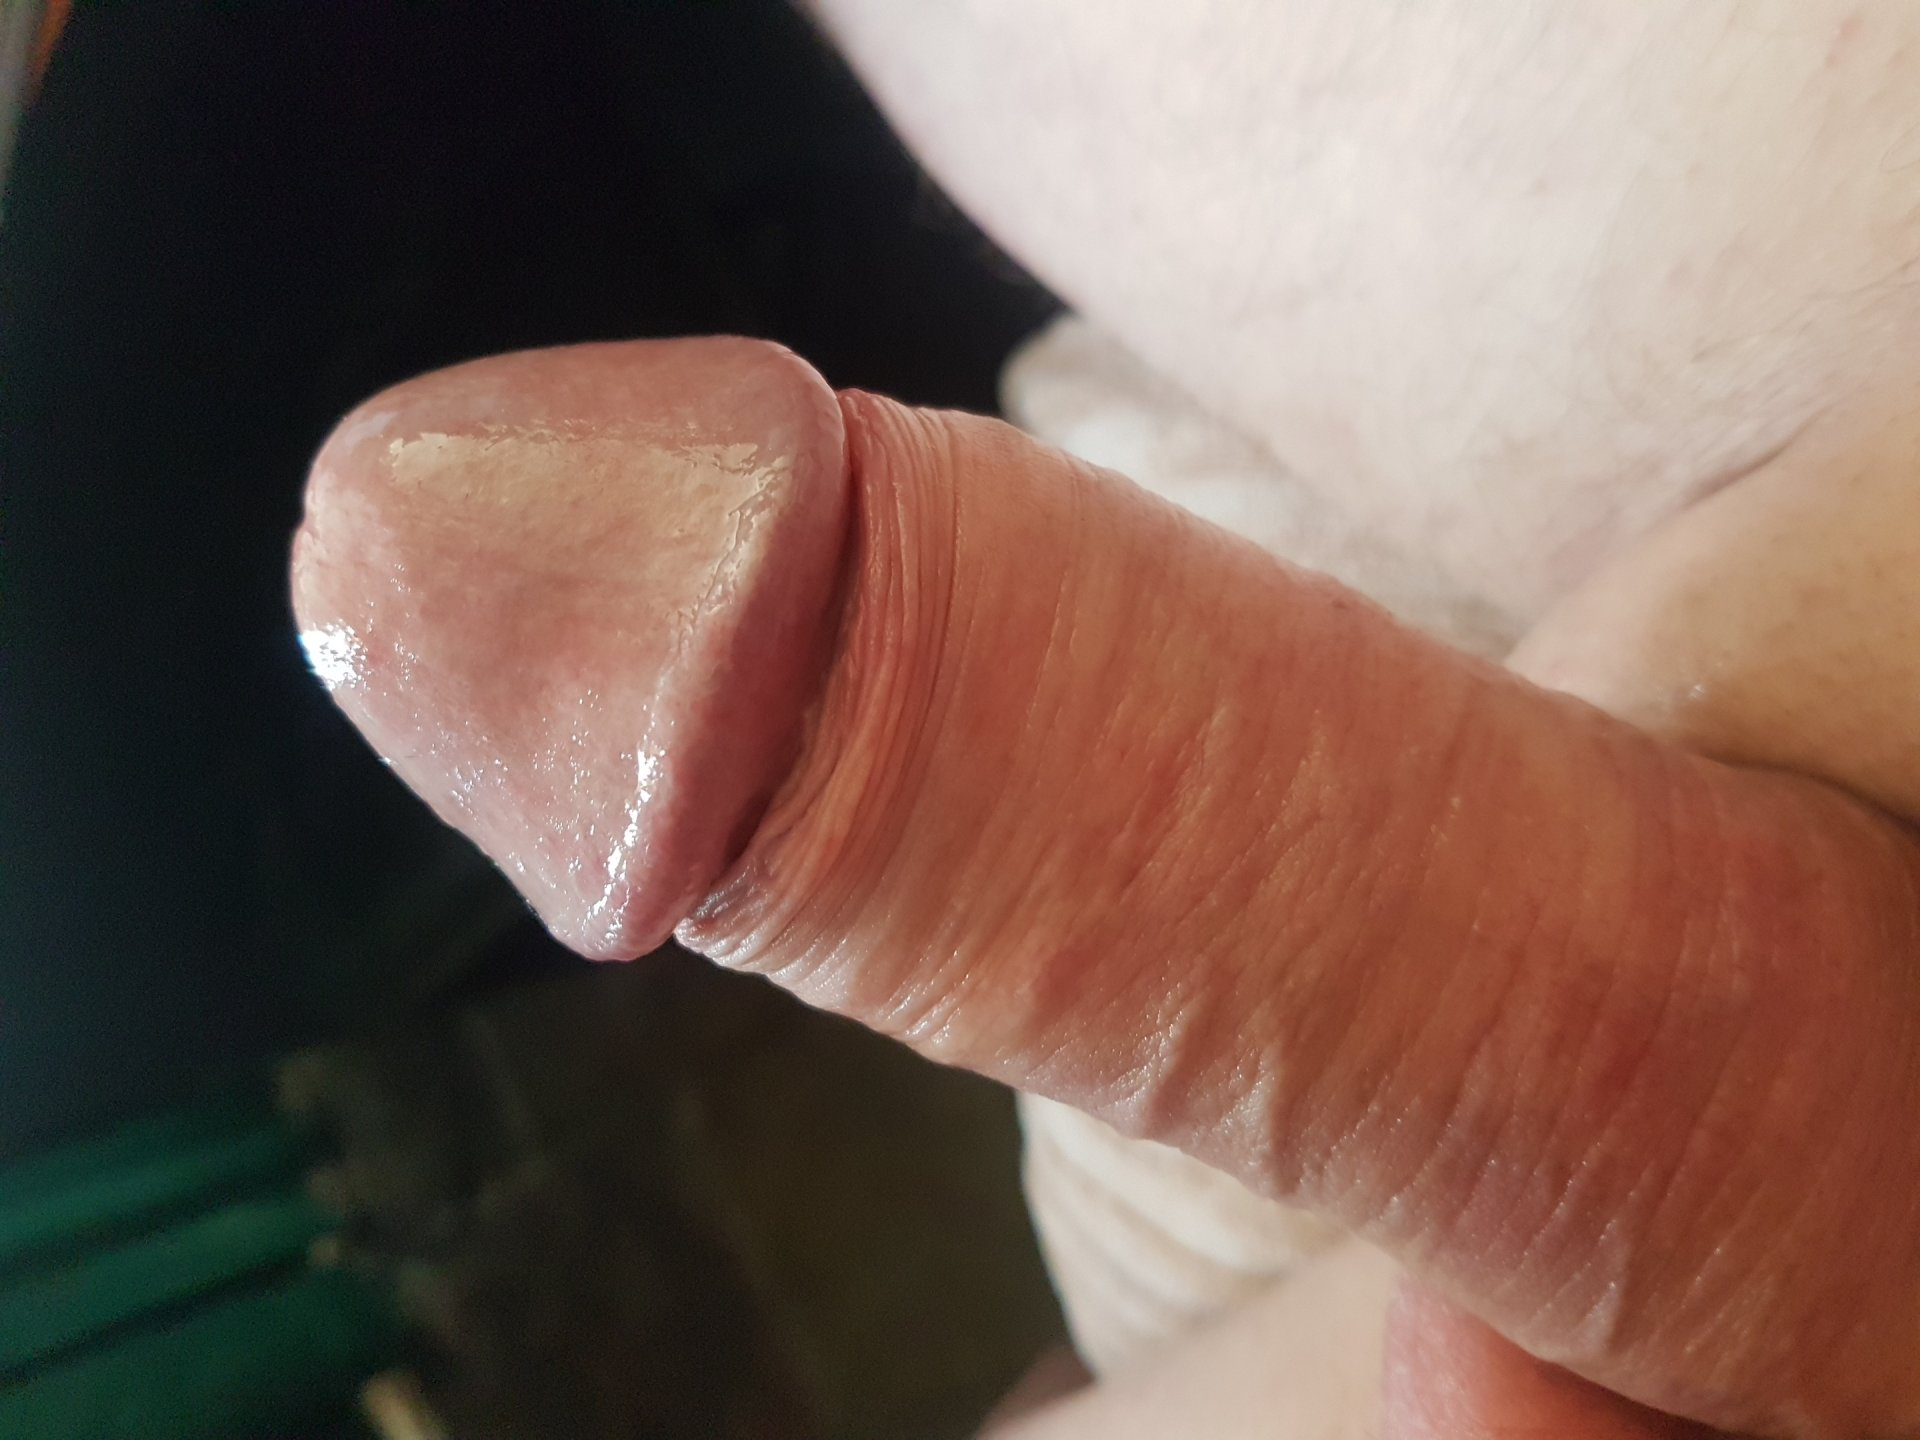 ahnosaj557 from South Australia,Australia